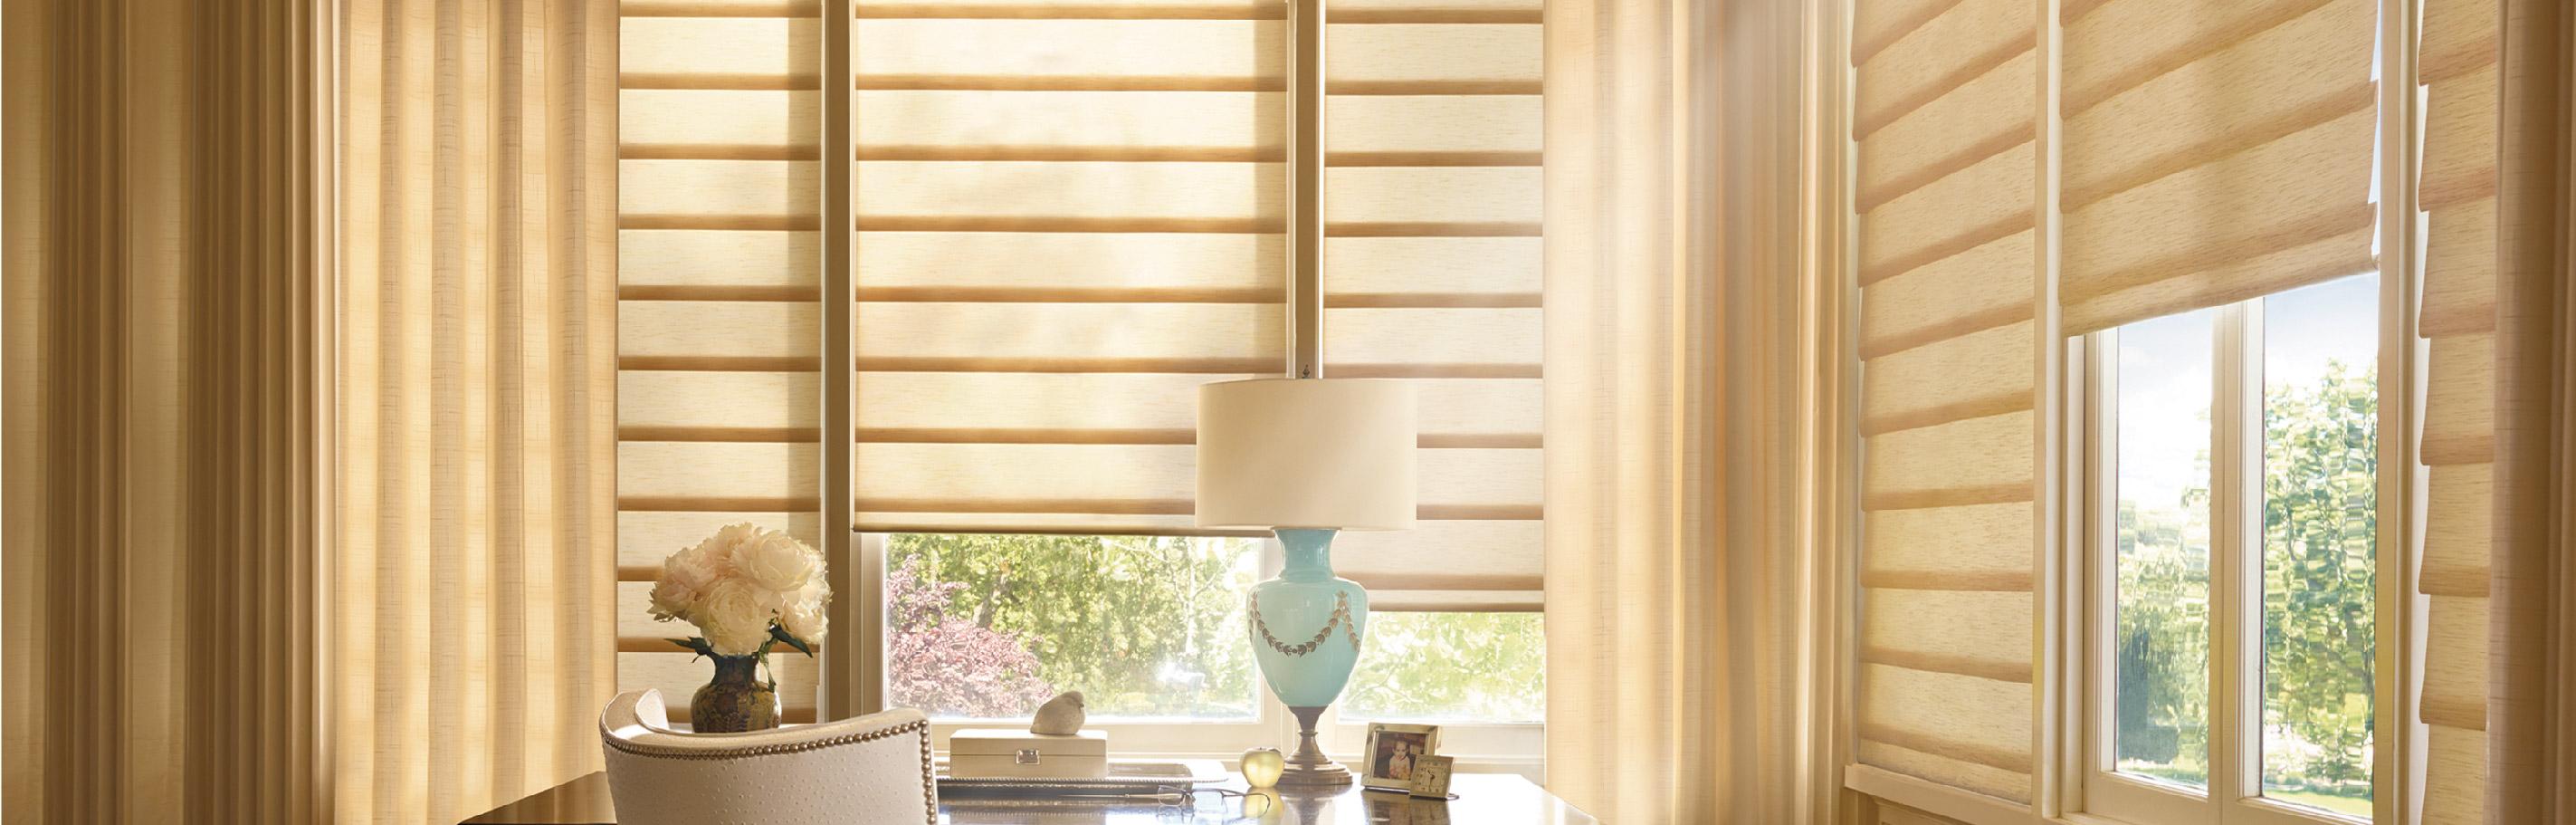 ideas x shades regarding modern size blinds contemporary treatments best window on